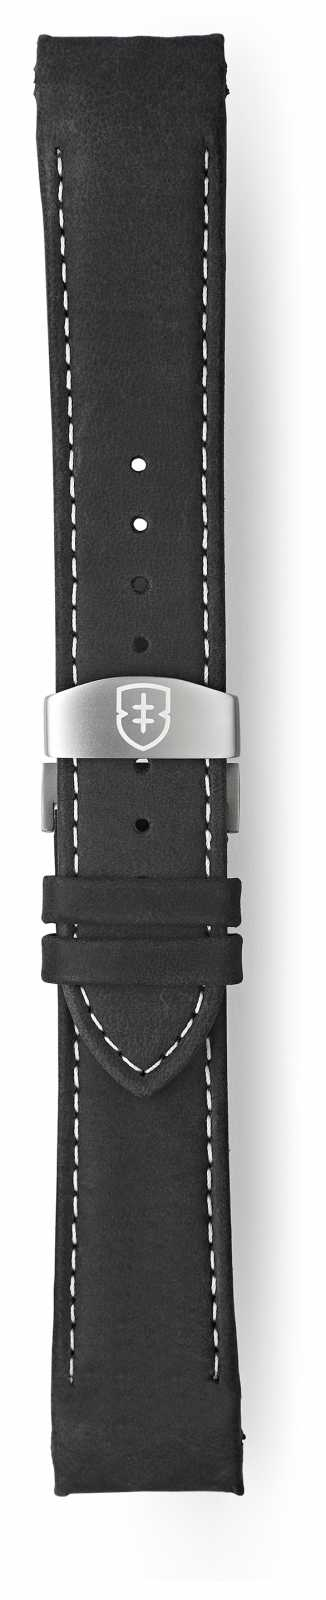 Elliot Brown Mens 22mm Black Matt Leather Deployant White Stitch Strap STR-L15